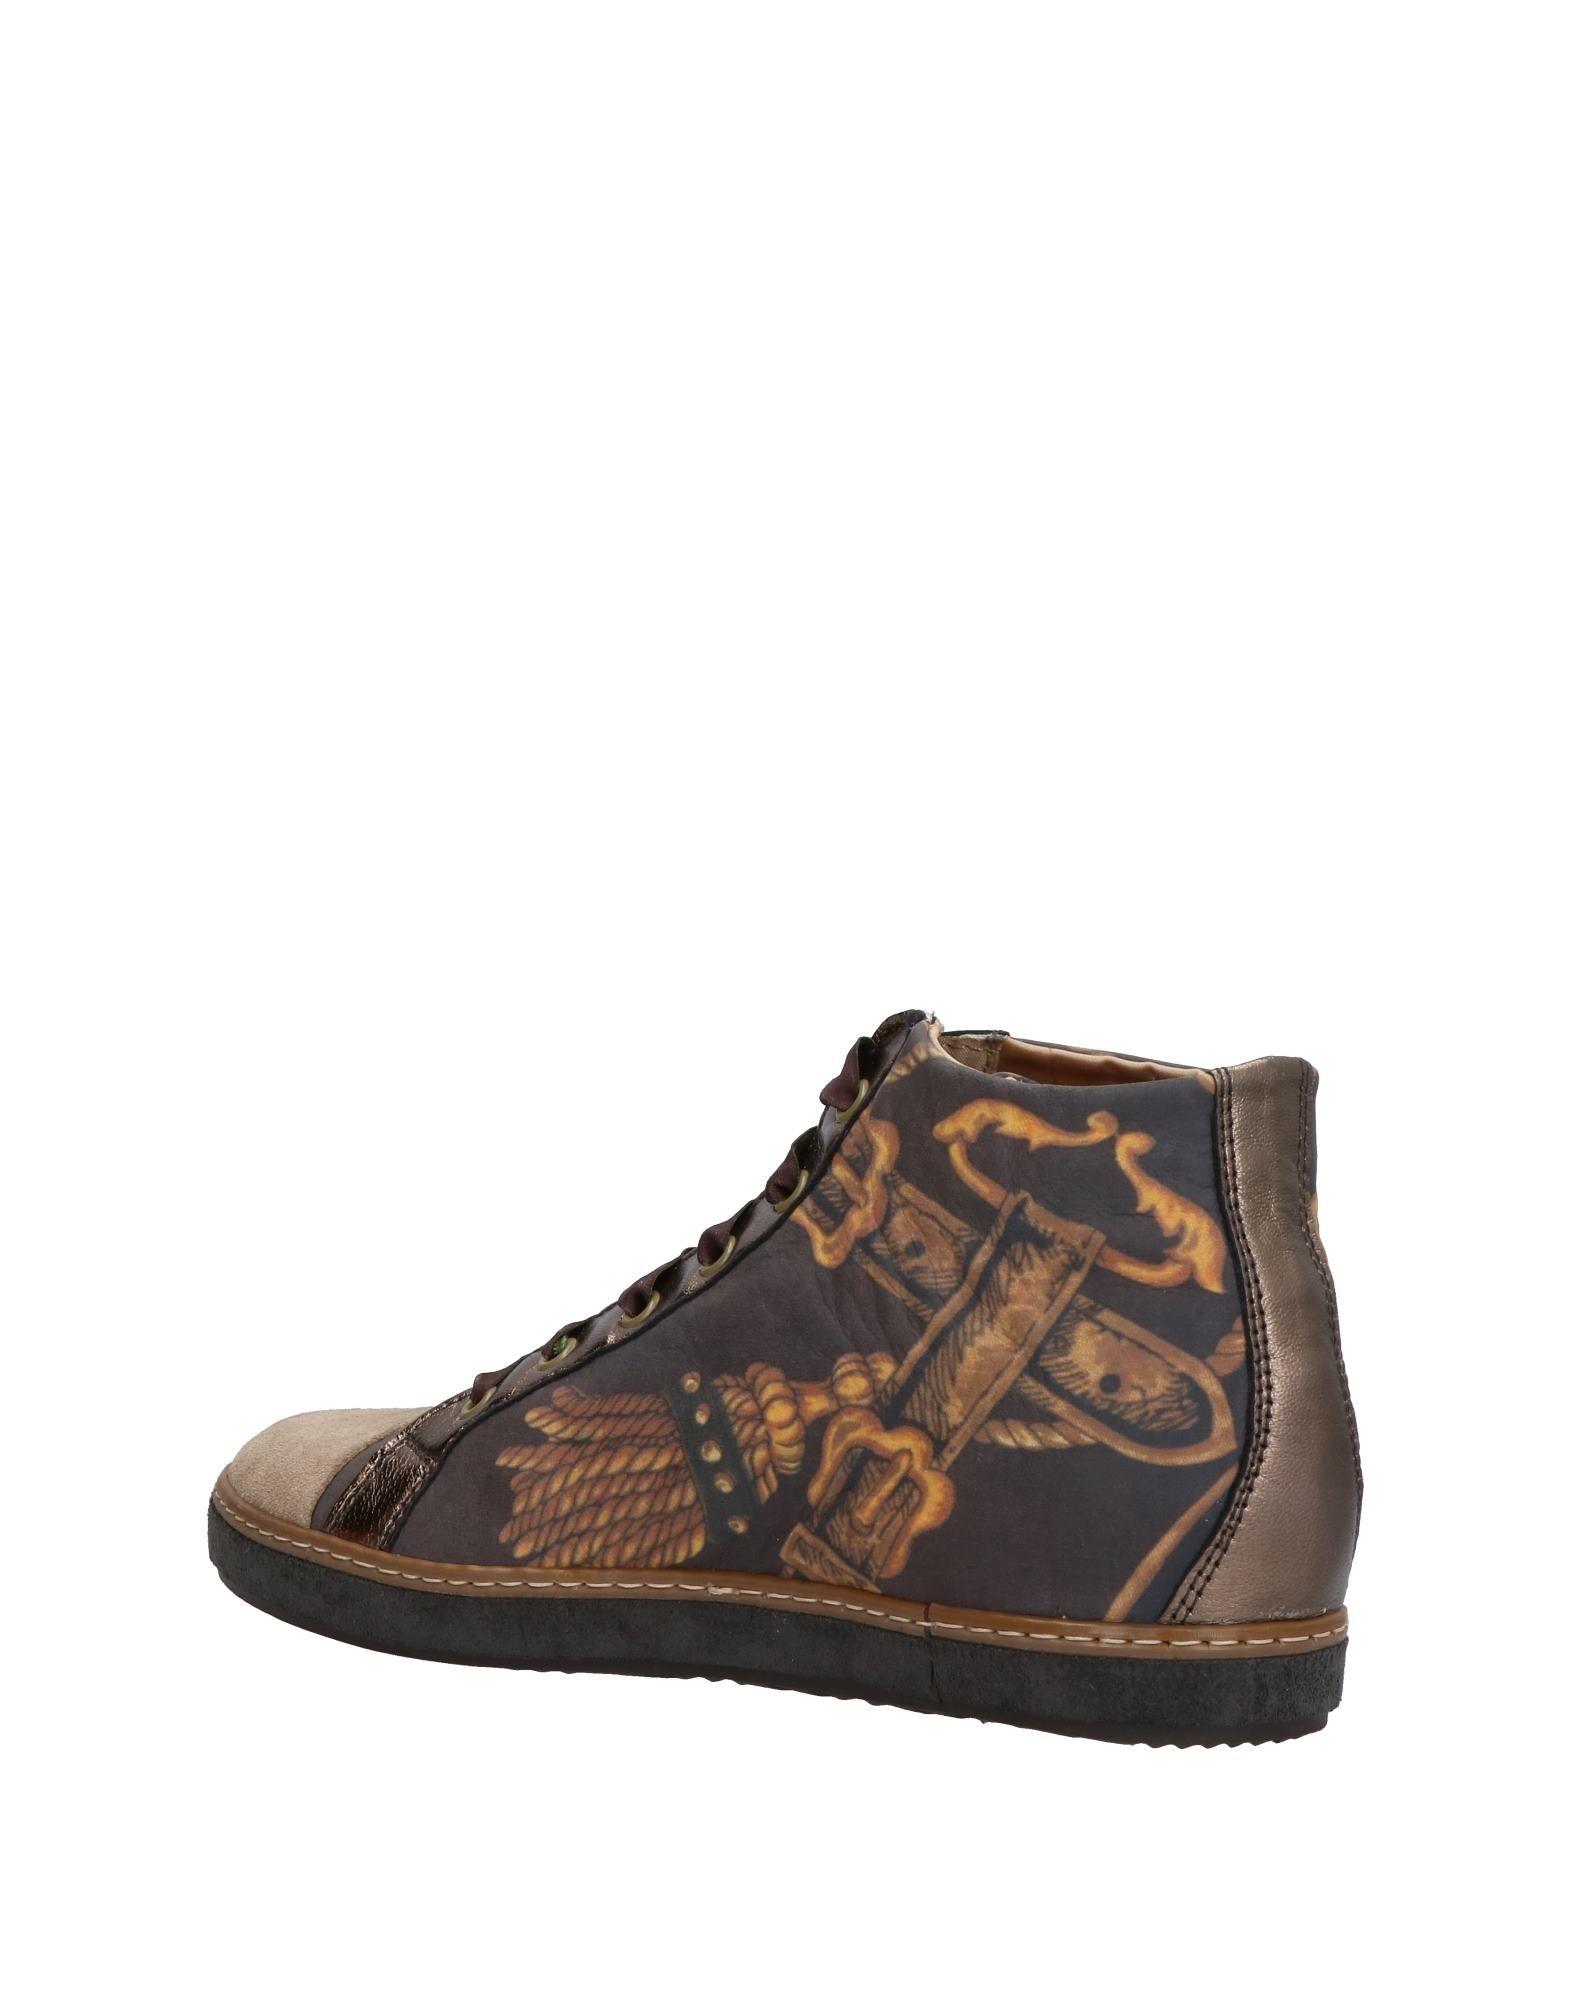 Soisire Soiebleu Sneakers - Women Soisire Soiebleu Sneakers Sneakers Sneakers online on  United Kingdom - 11337952VV f2bffc